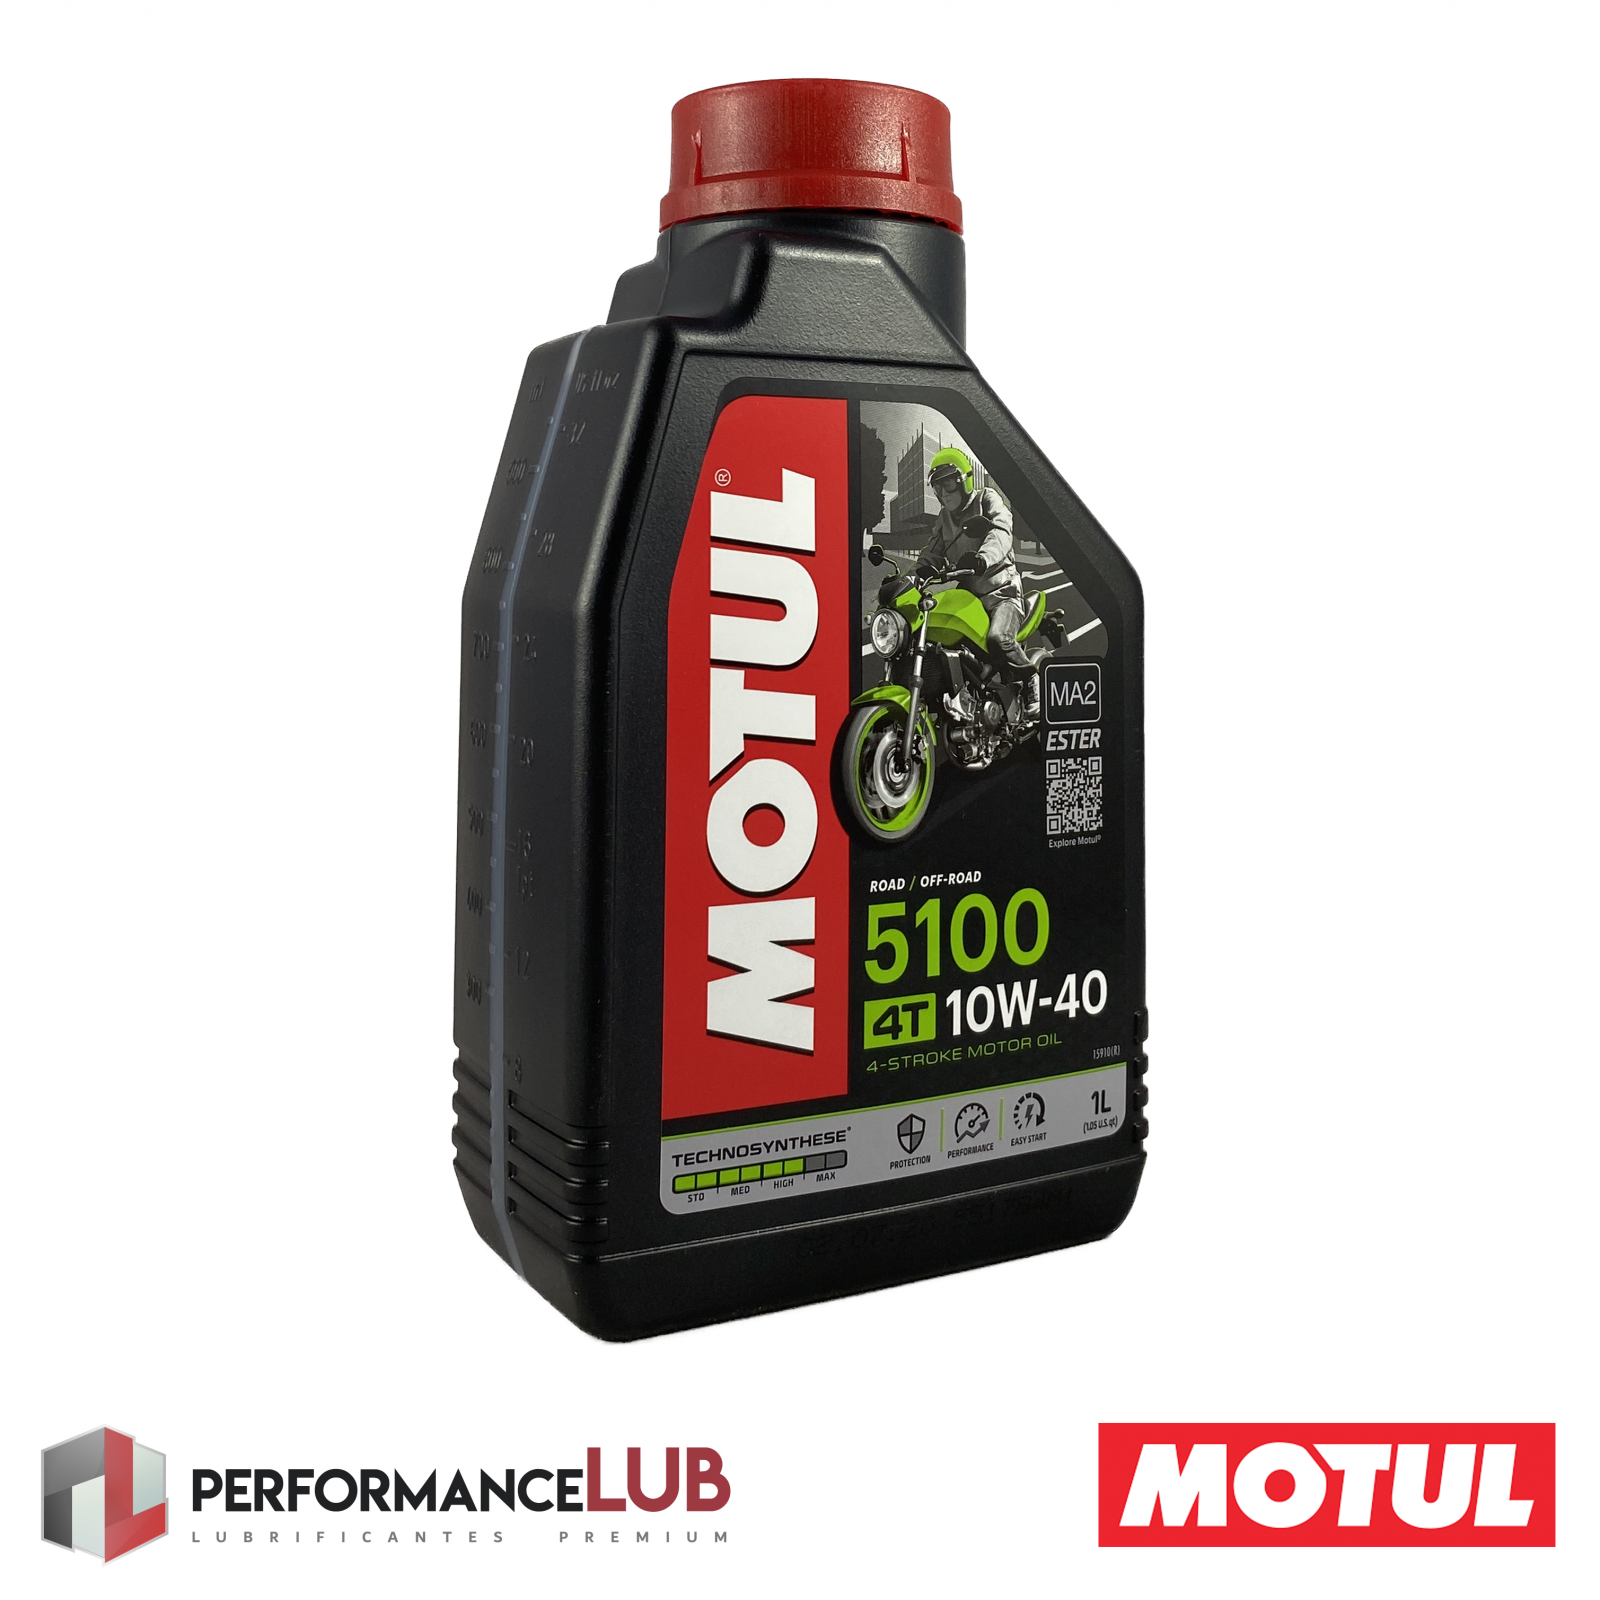 5100 4T 10W40 - JASO MA2 - 1 litro - PerformanceLUB Lubrificantes Premium